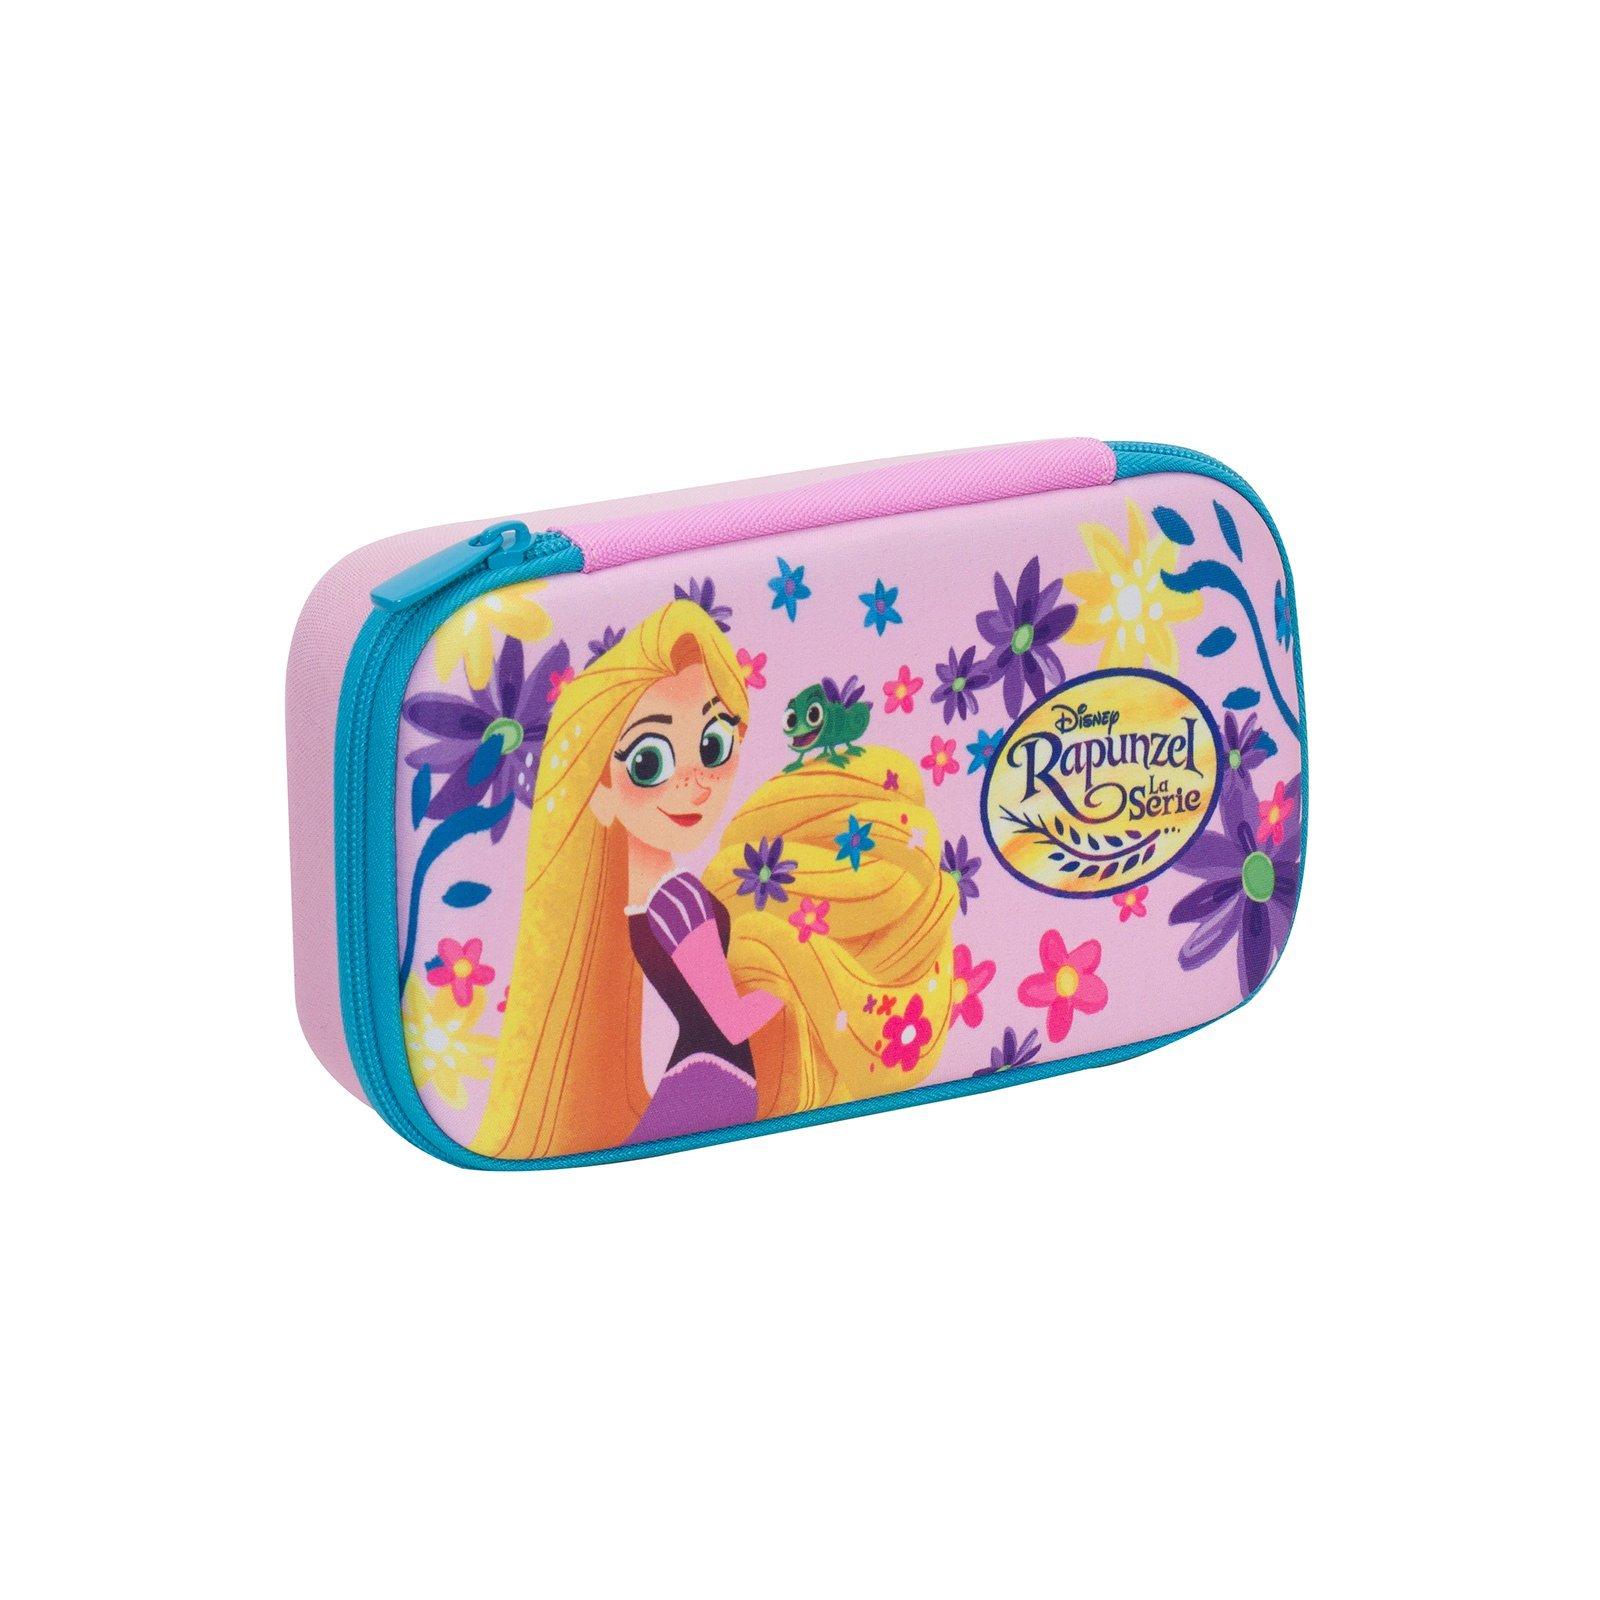 Estuche attrezzato Rapunzel Quick Case Seven